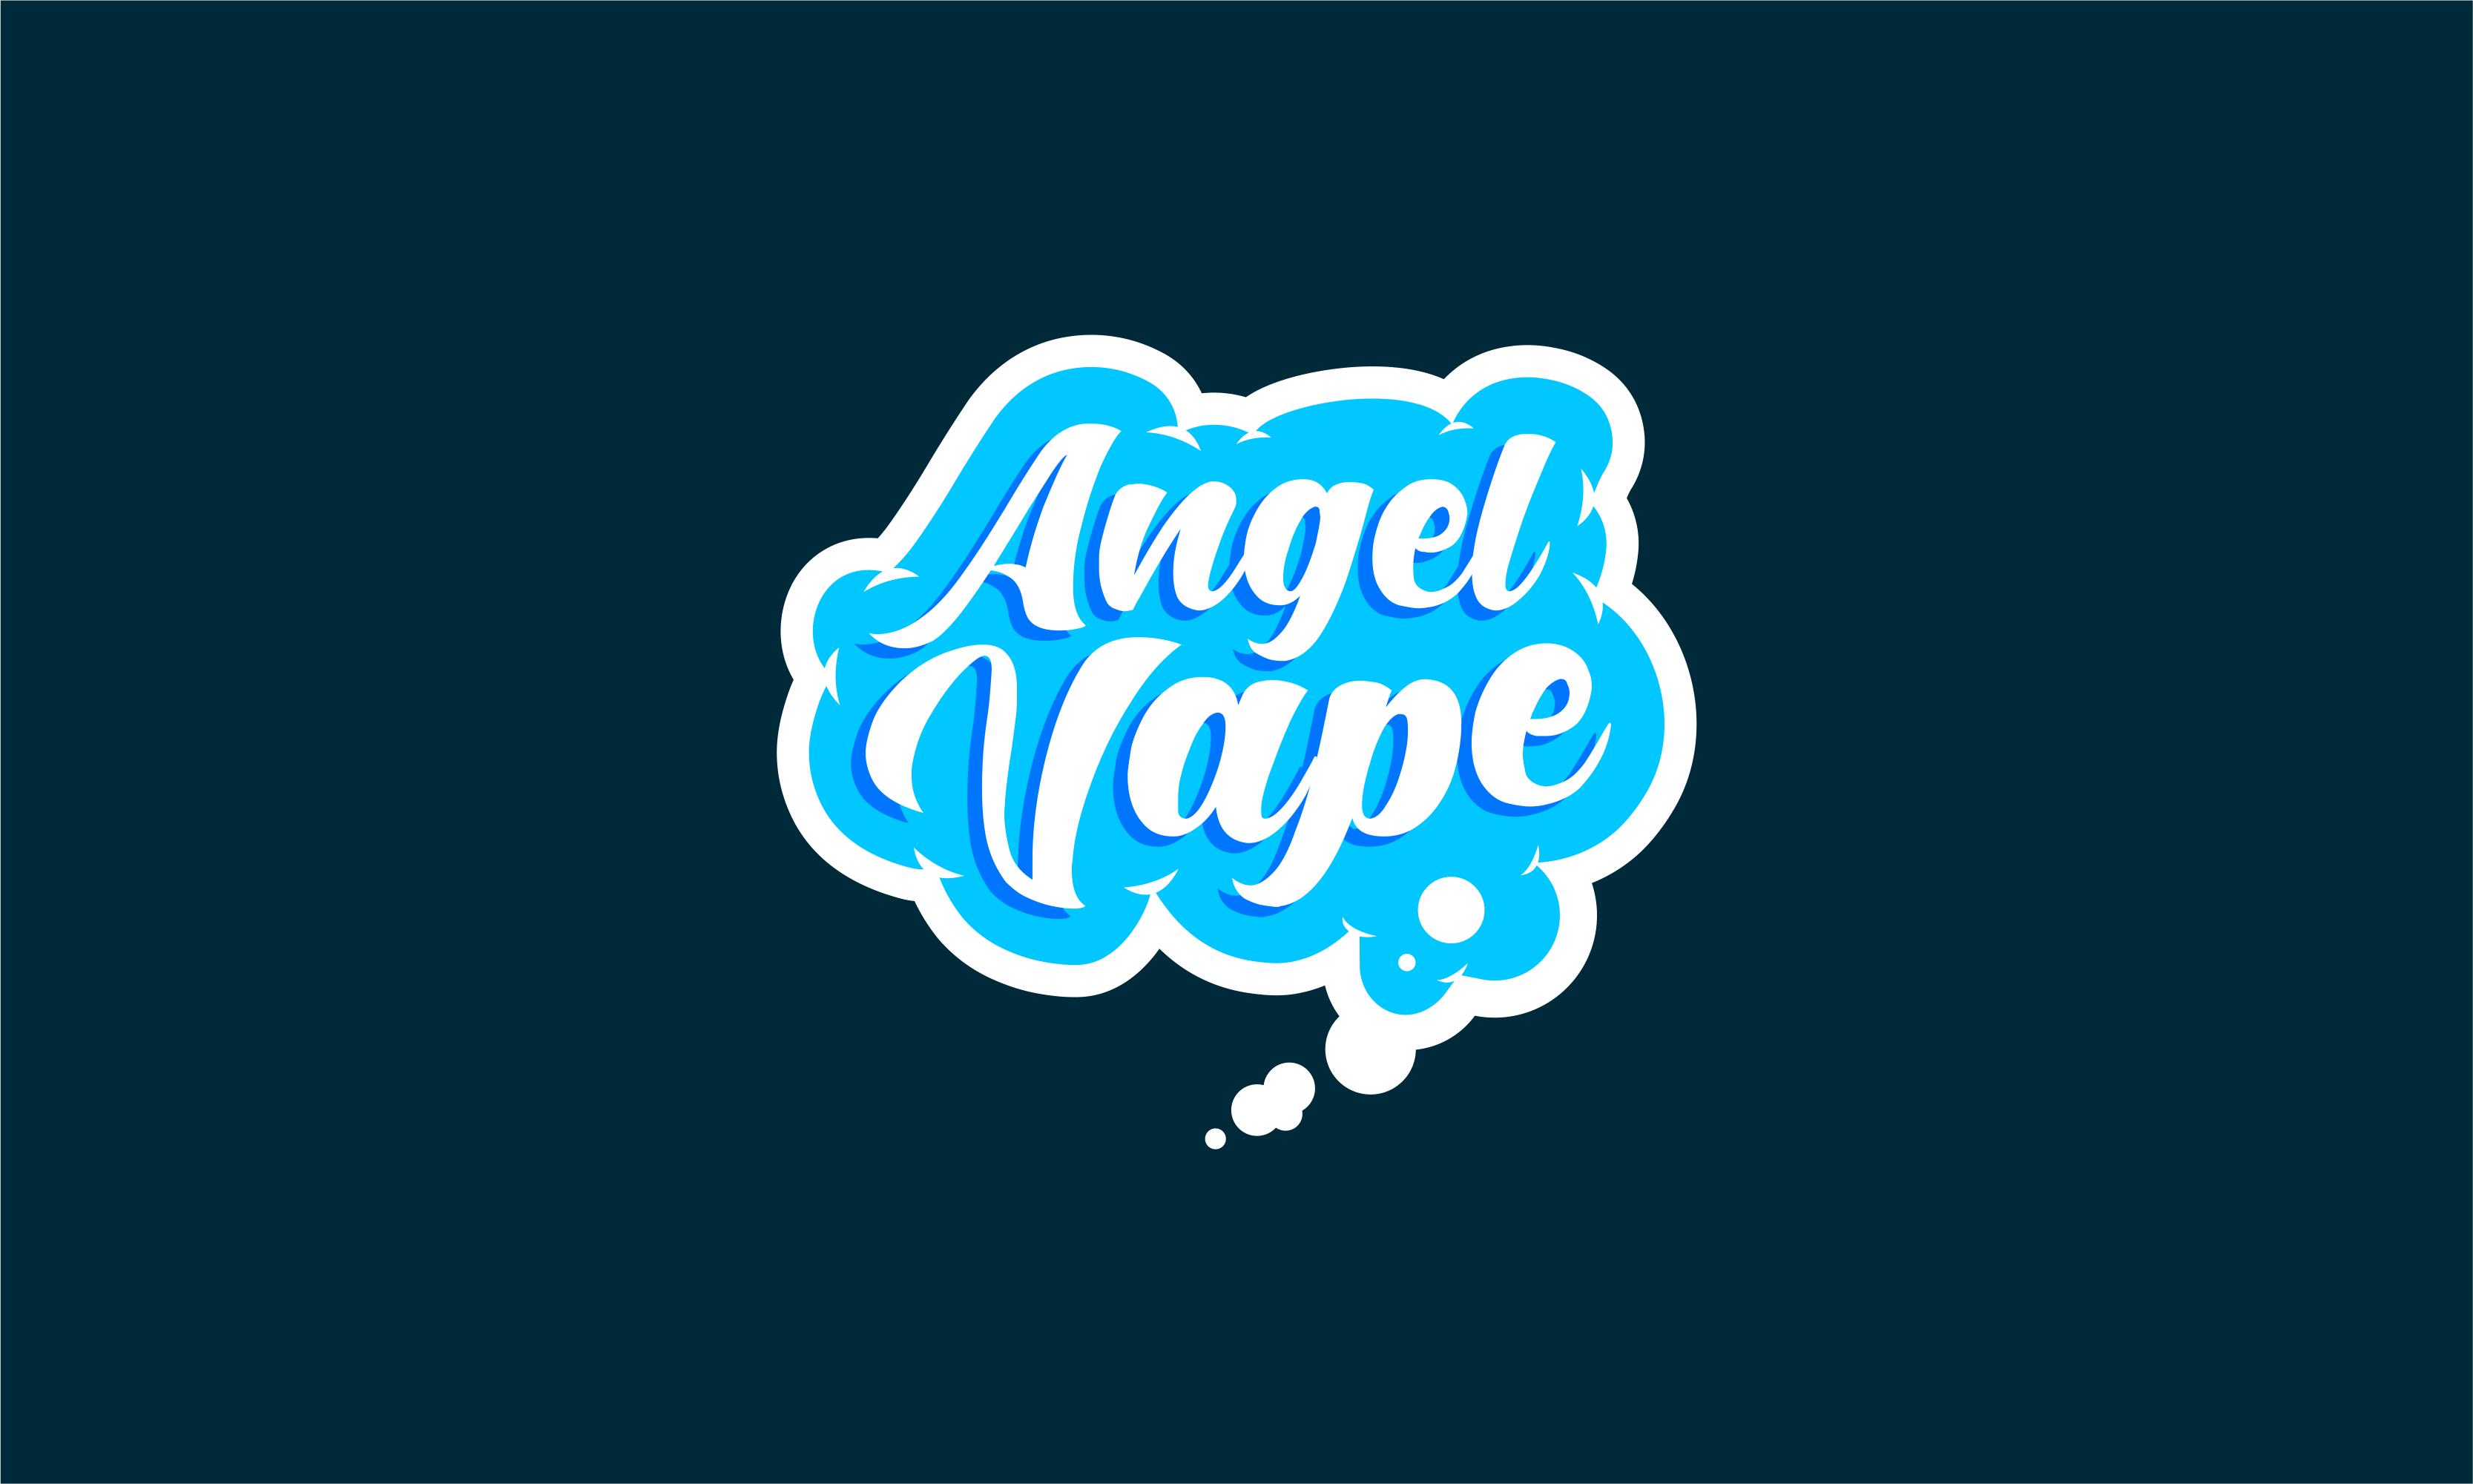 Angelvape